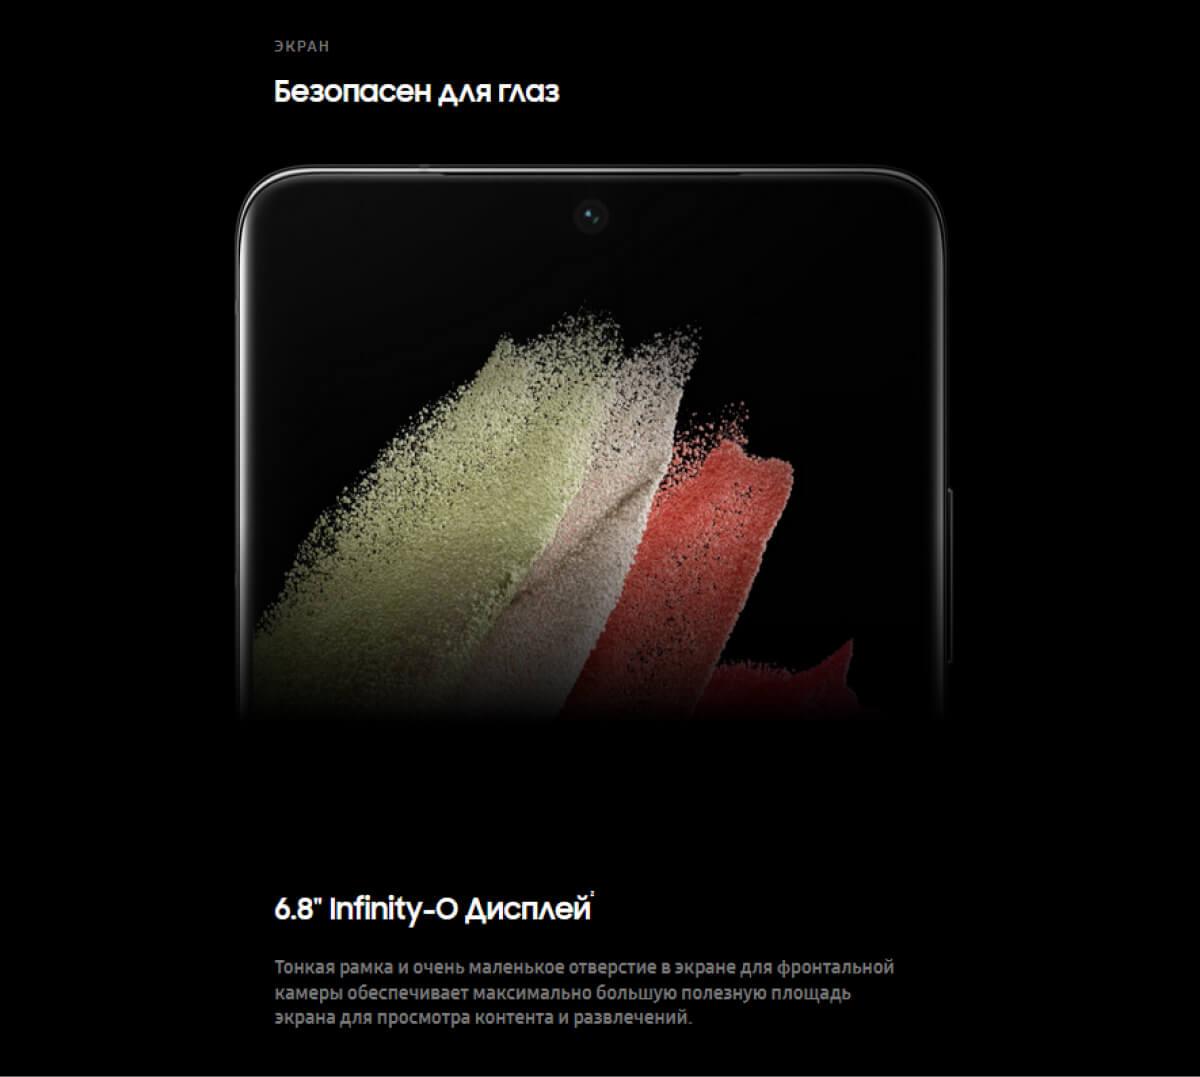 Samsung Galaxy S21 Ultra 5G Чёрный фантом